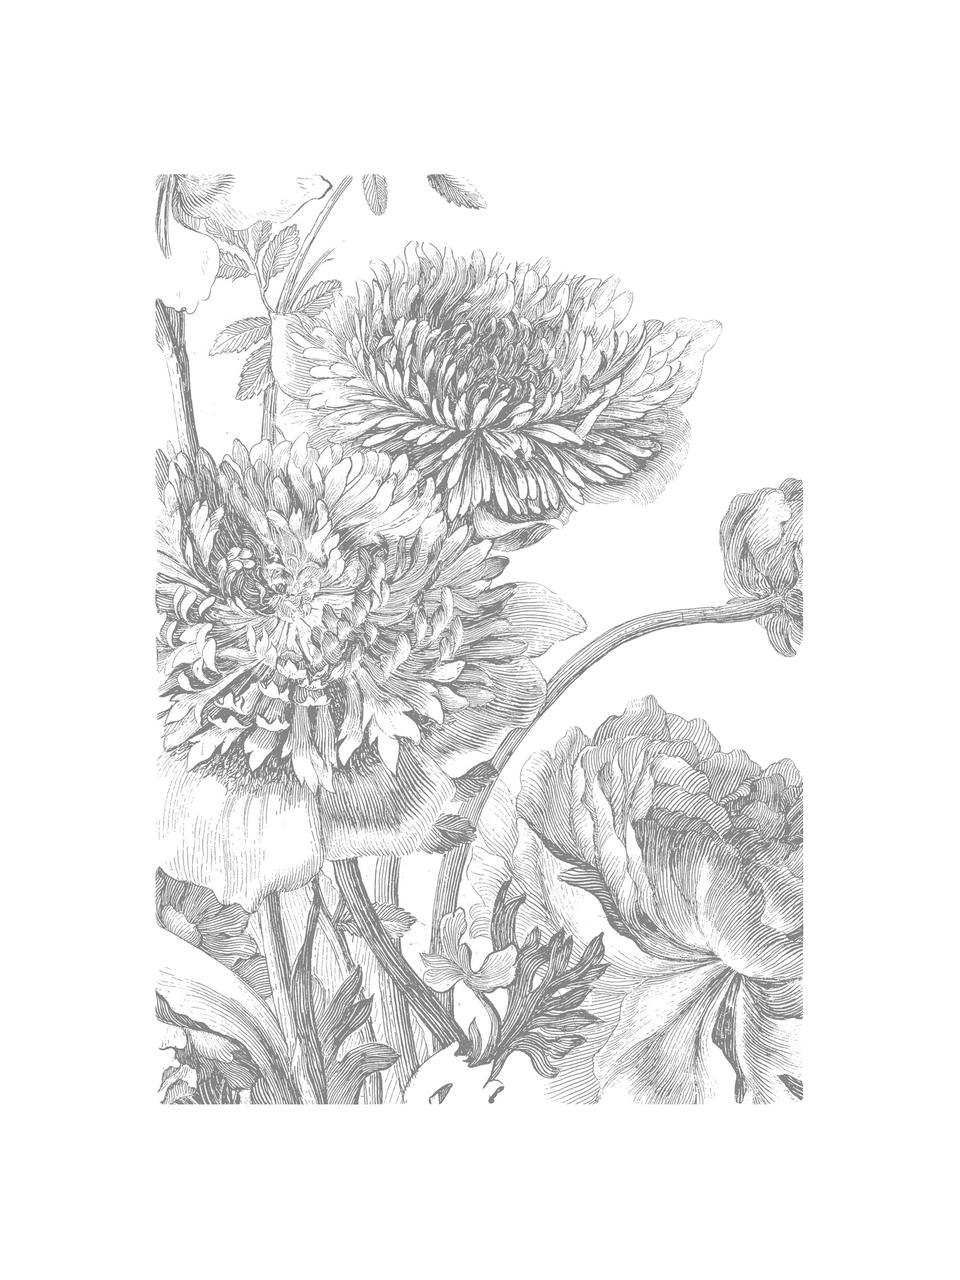 Carta da parati Engraved Flowers, Tessuto non tessuto, ecologico e biodegradabile, Grigio, bianco, Larg. 389 x Alt. 280 cm